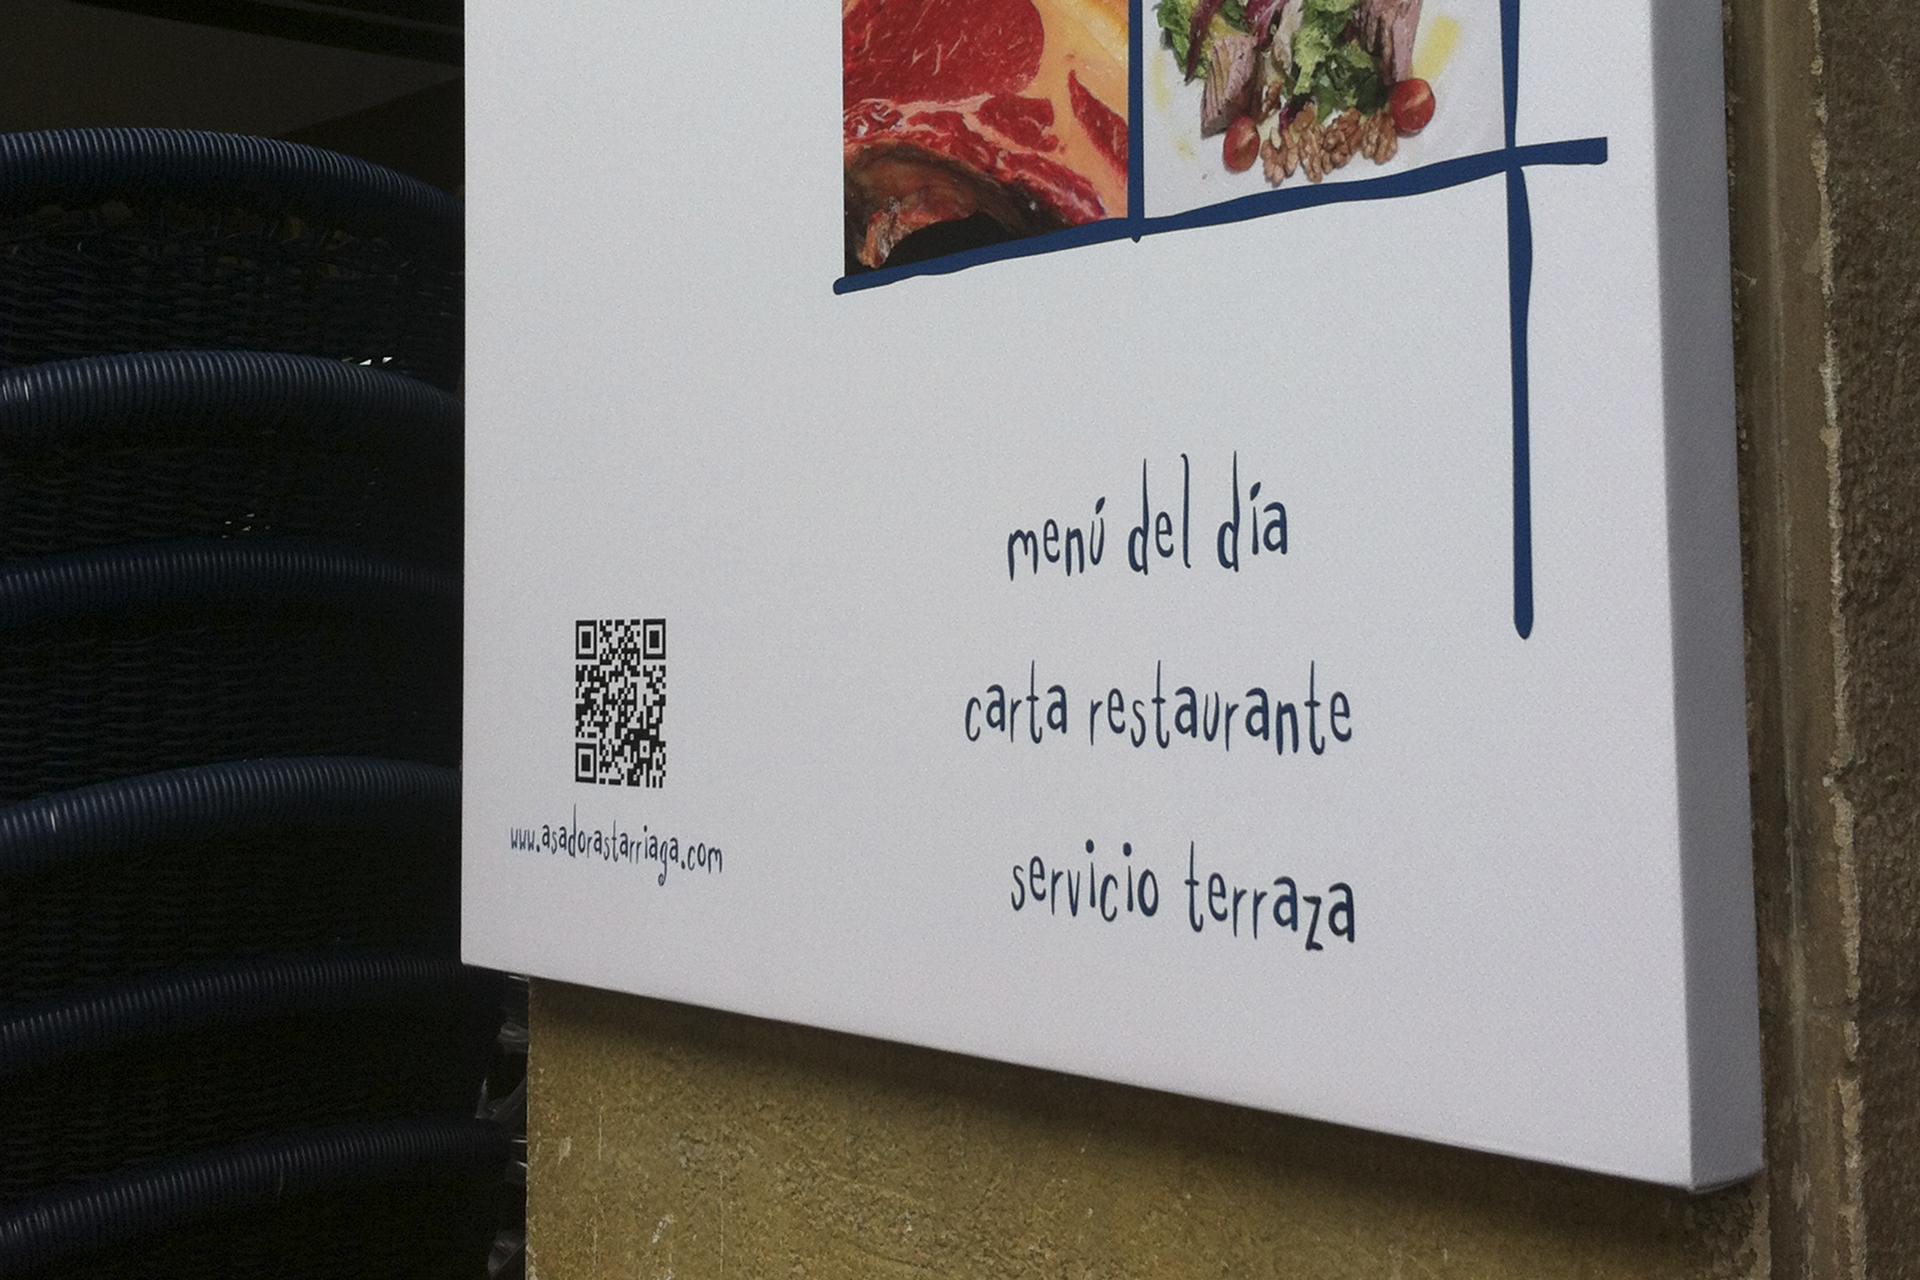 restaurante_astarriaga_lona_impresa_bastidor